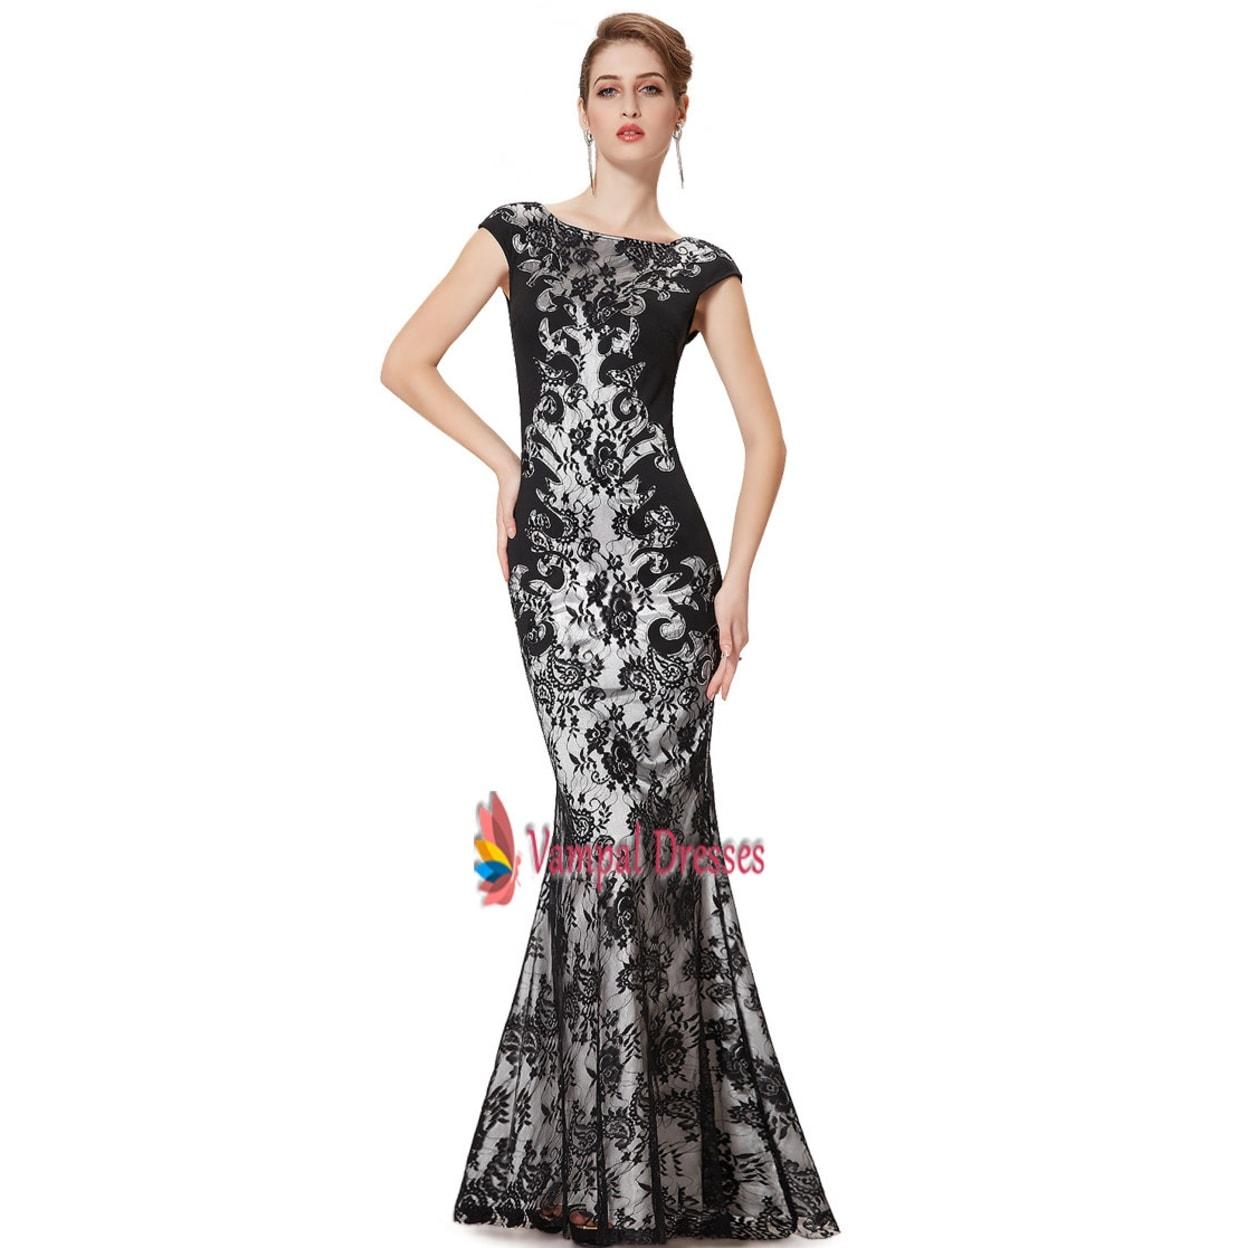 Black Lace Mermaid Prom Dresses 2015,Long